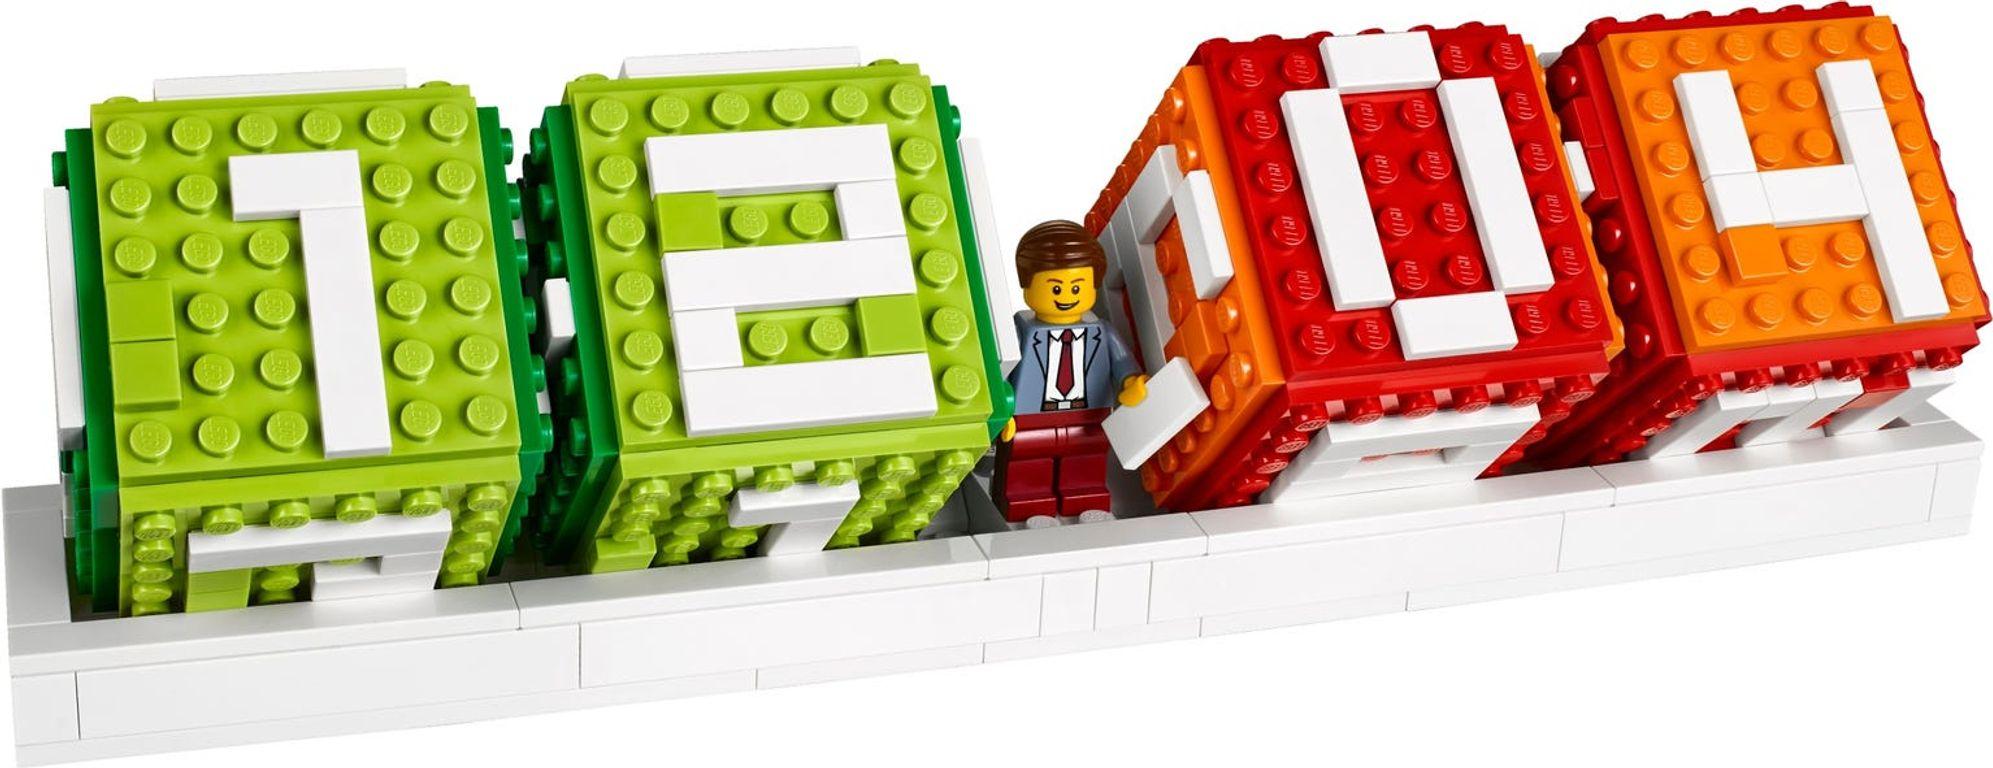 Iconic Brick Calendar gameplay